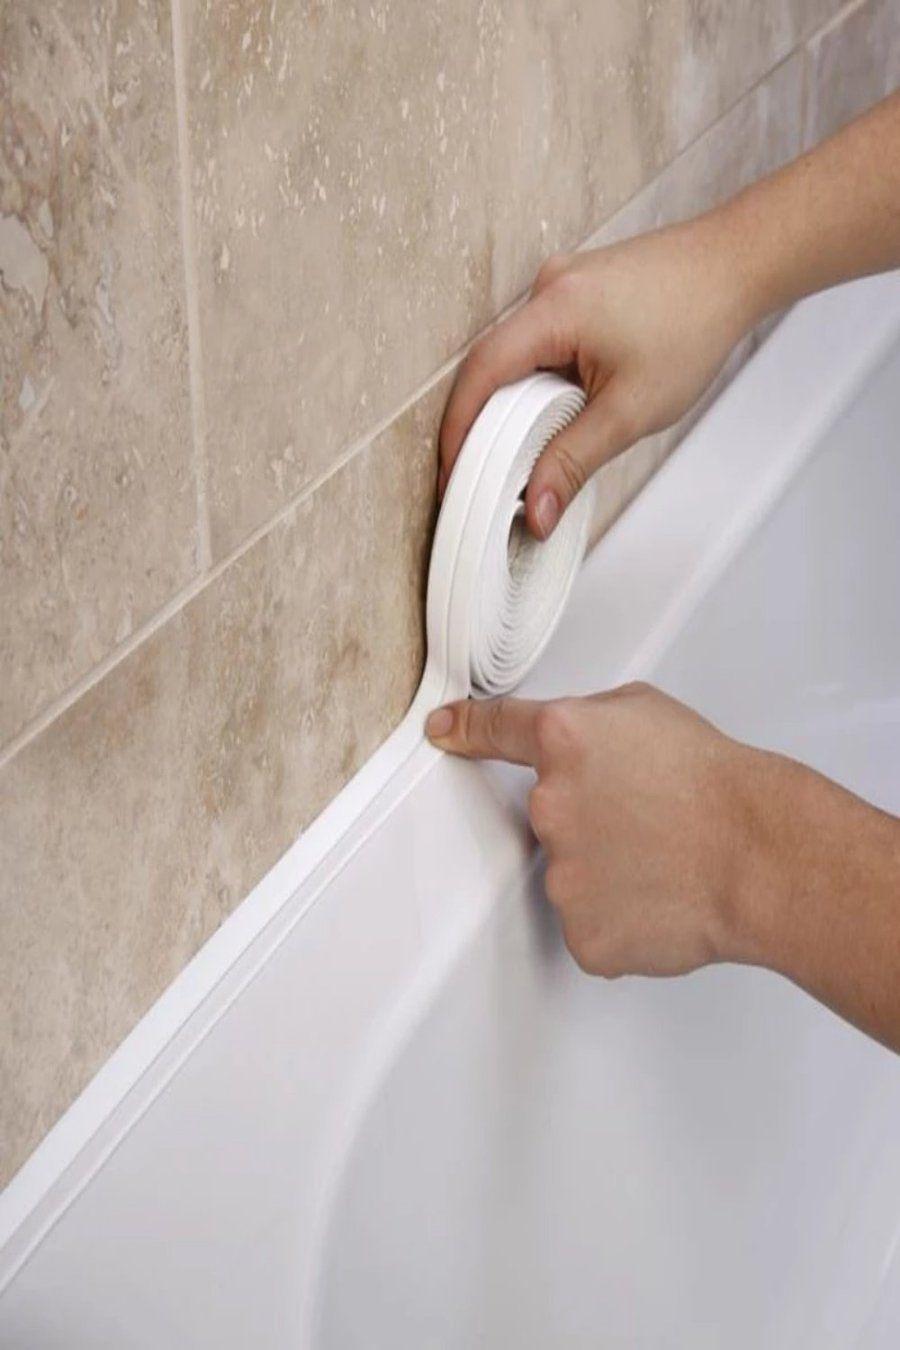 3 4mx38mm Bathroom Shower Sink Bath Sealing Strip Tape White Pvc Self Accesstor Bathroom Wall Stickers Diy Home Cleaning Diy Home Repair